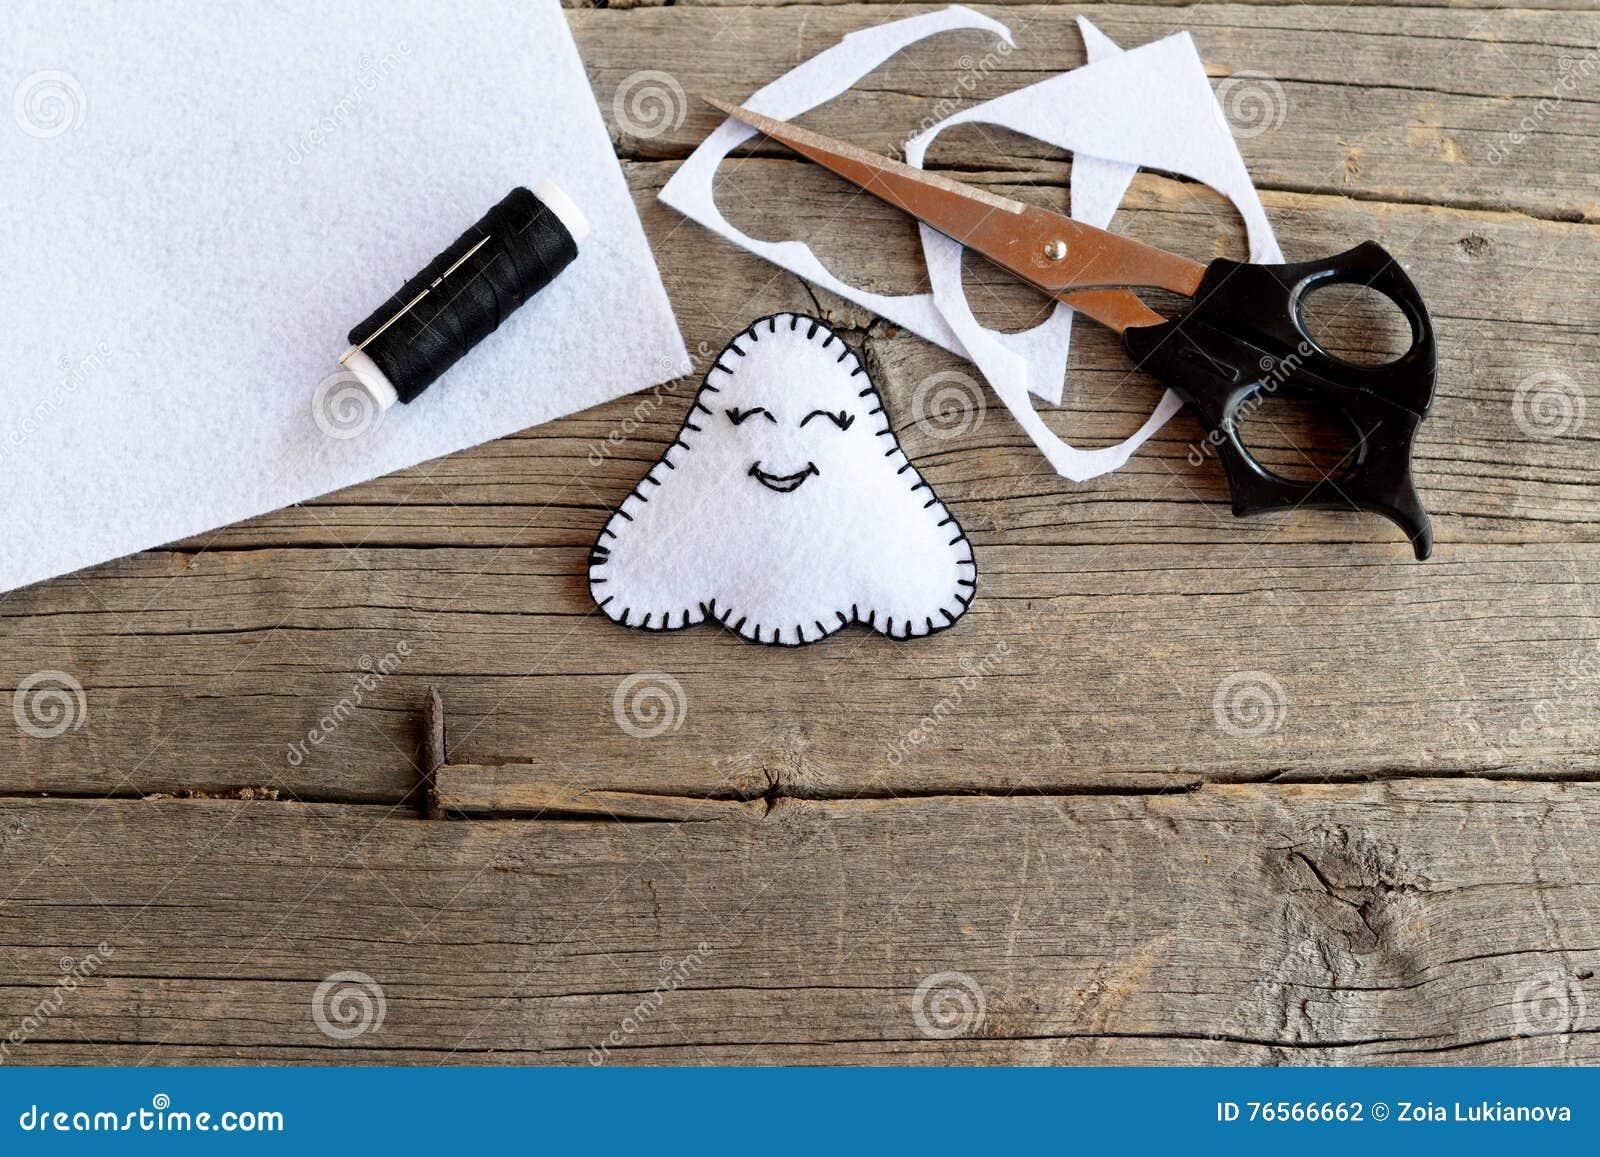 Little White Halloween Ghost Decor Scissors Black Thread Pieces